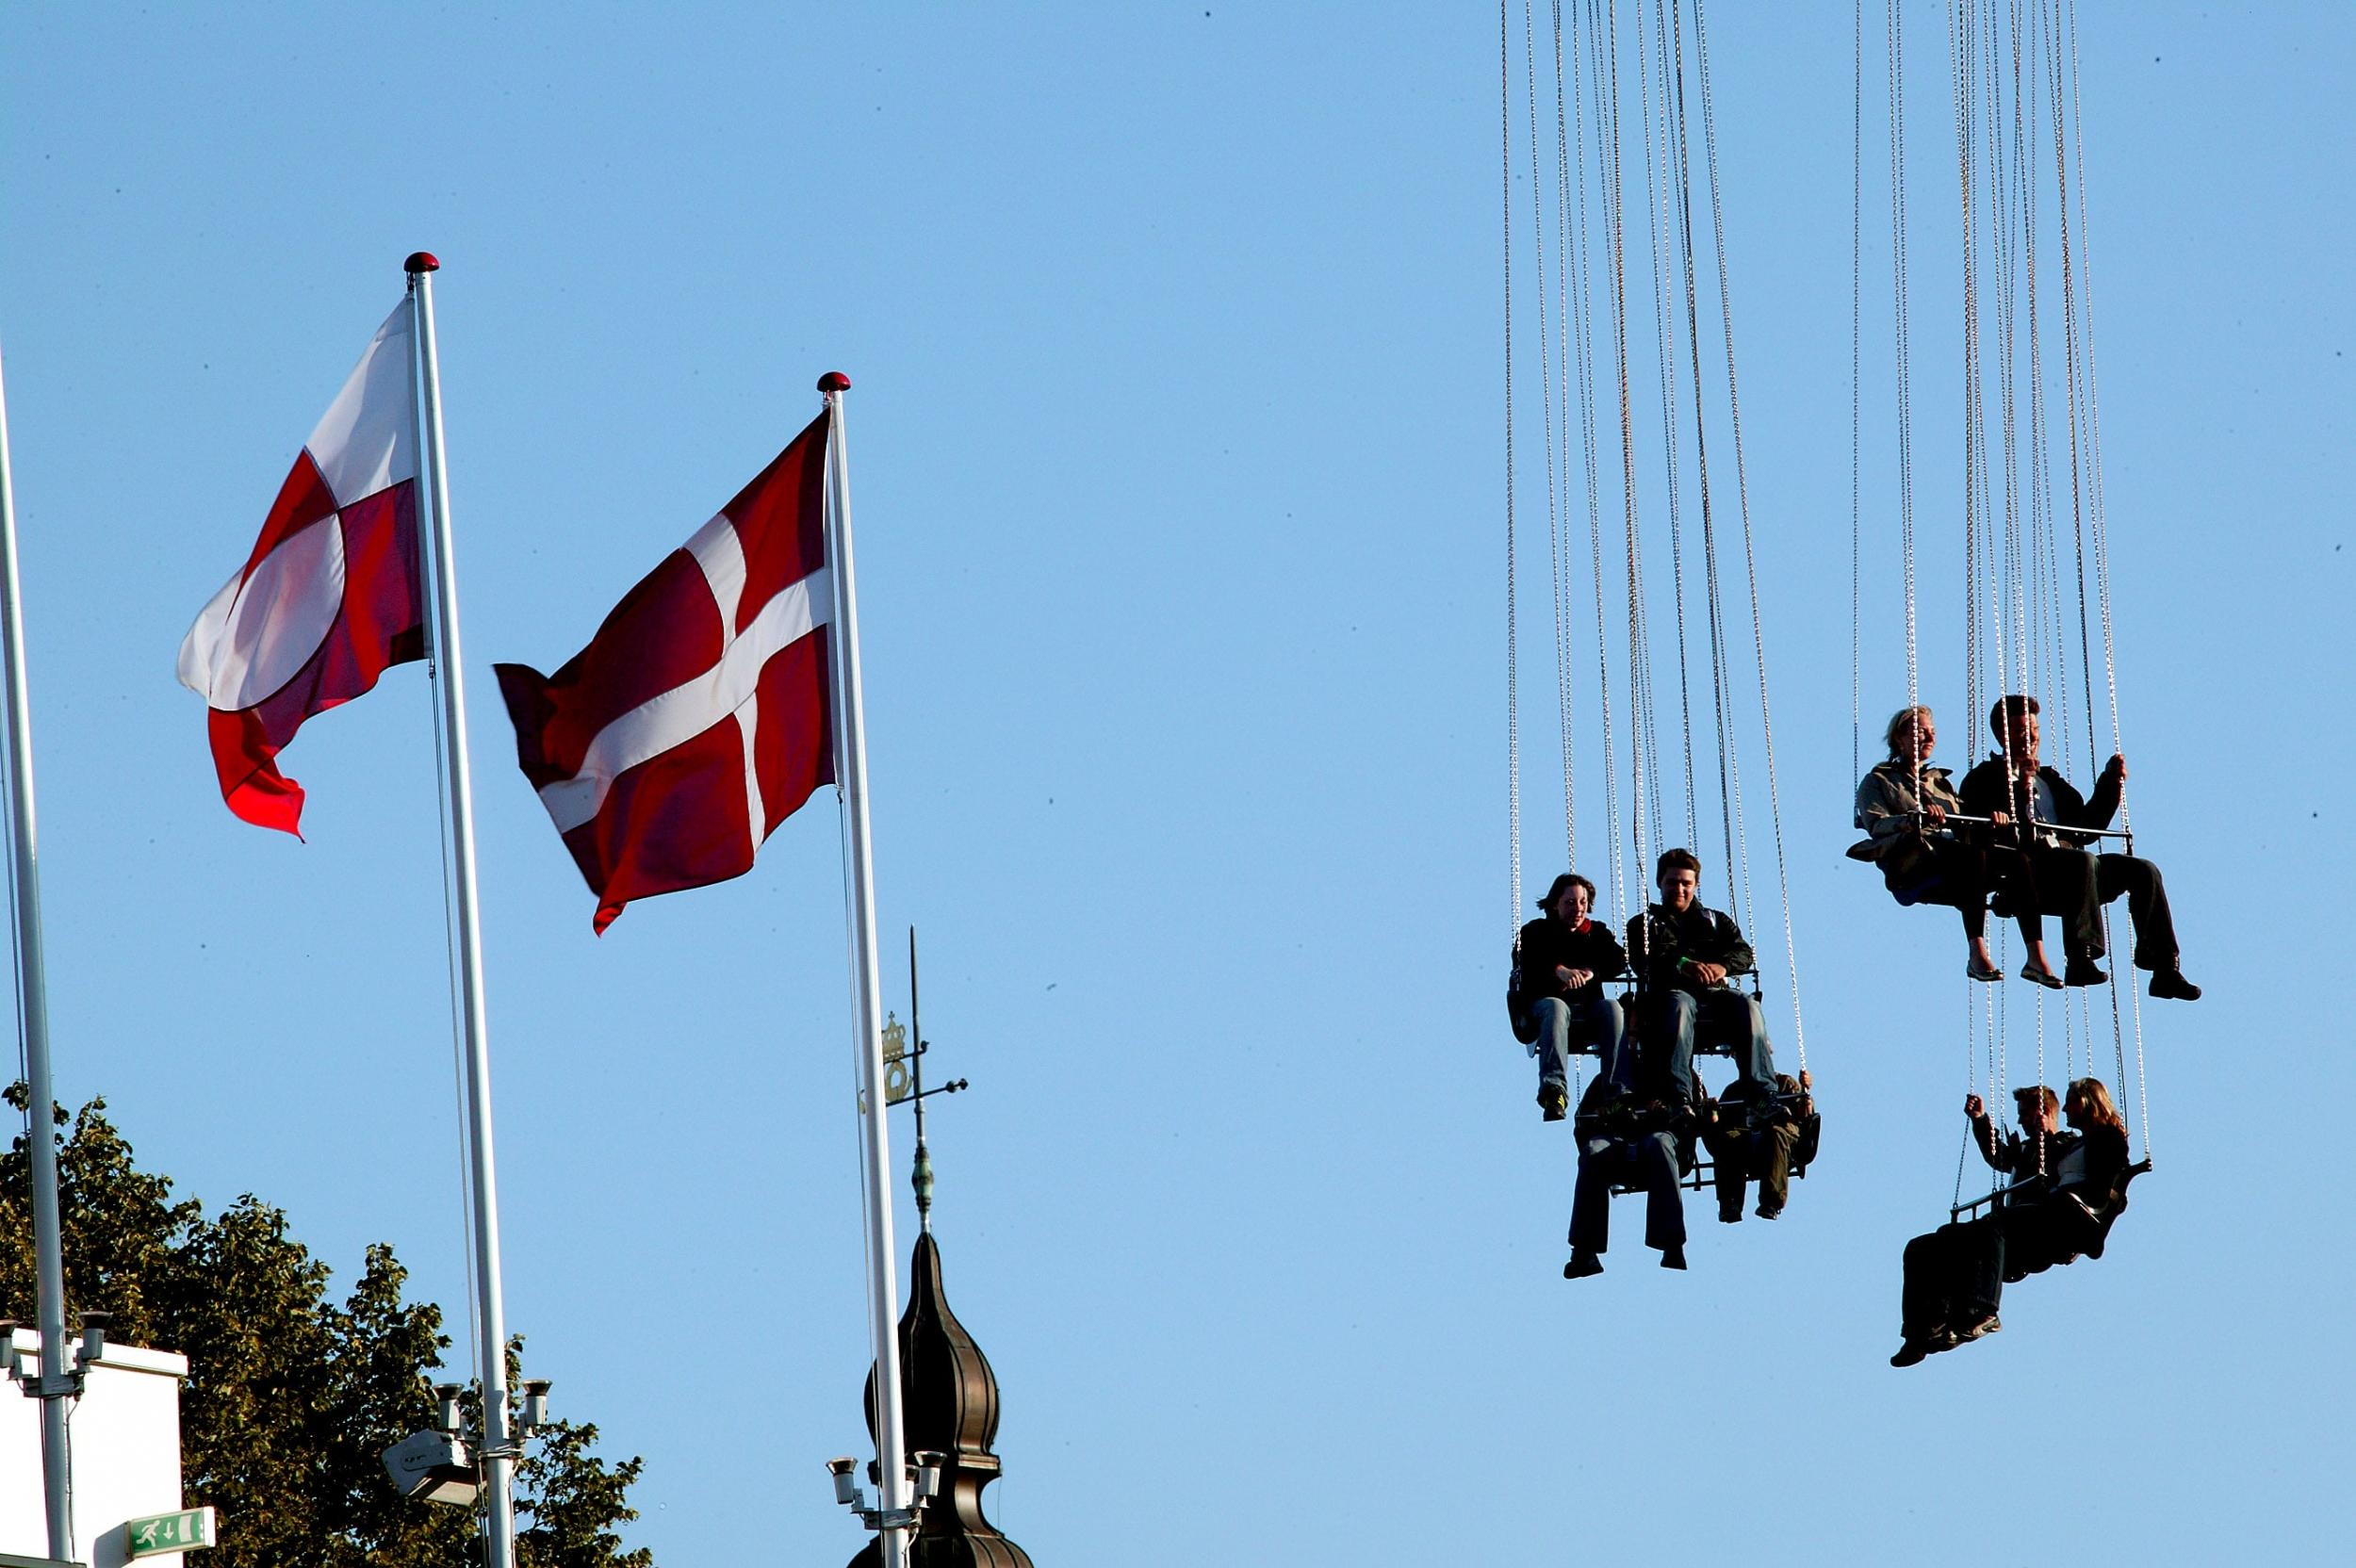 Greenland in The Tivoli Gardens, Copenhagen. Photo by Visit Greenland